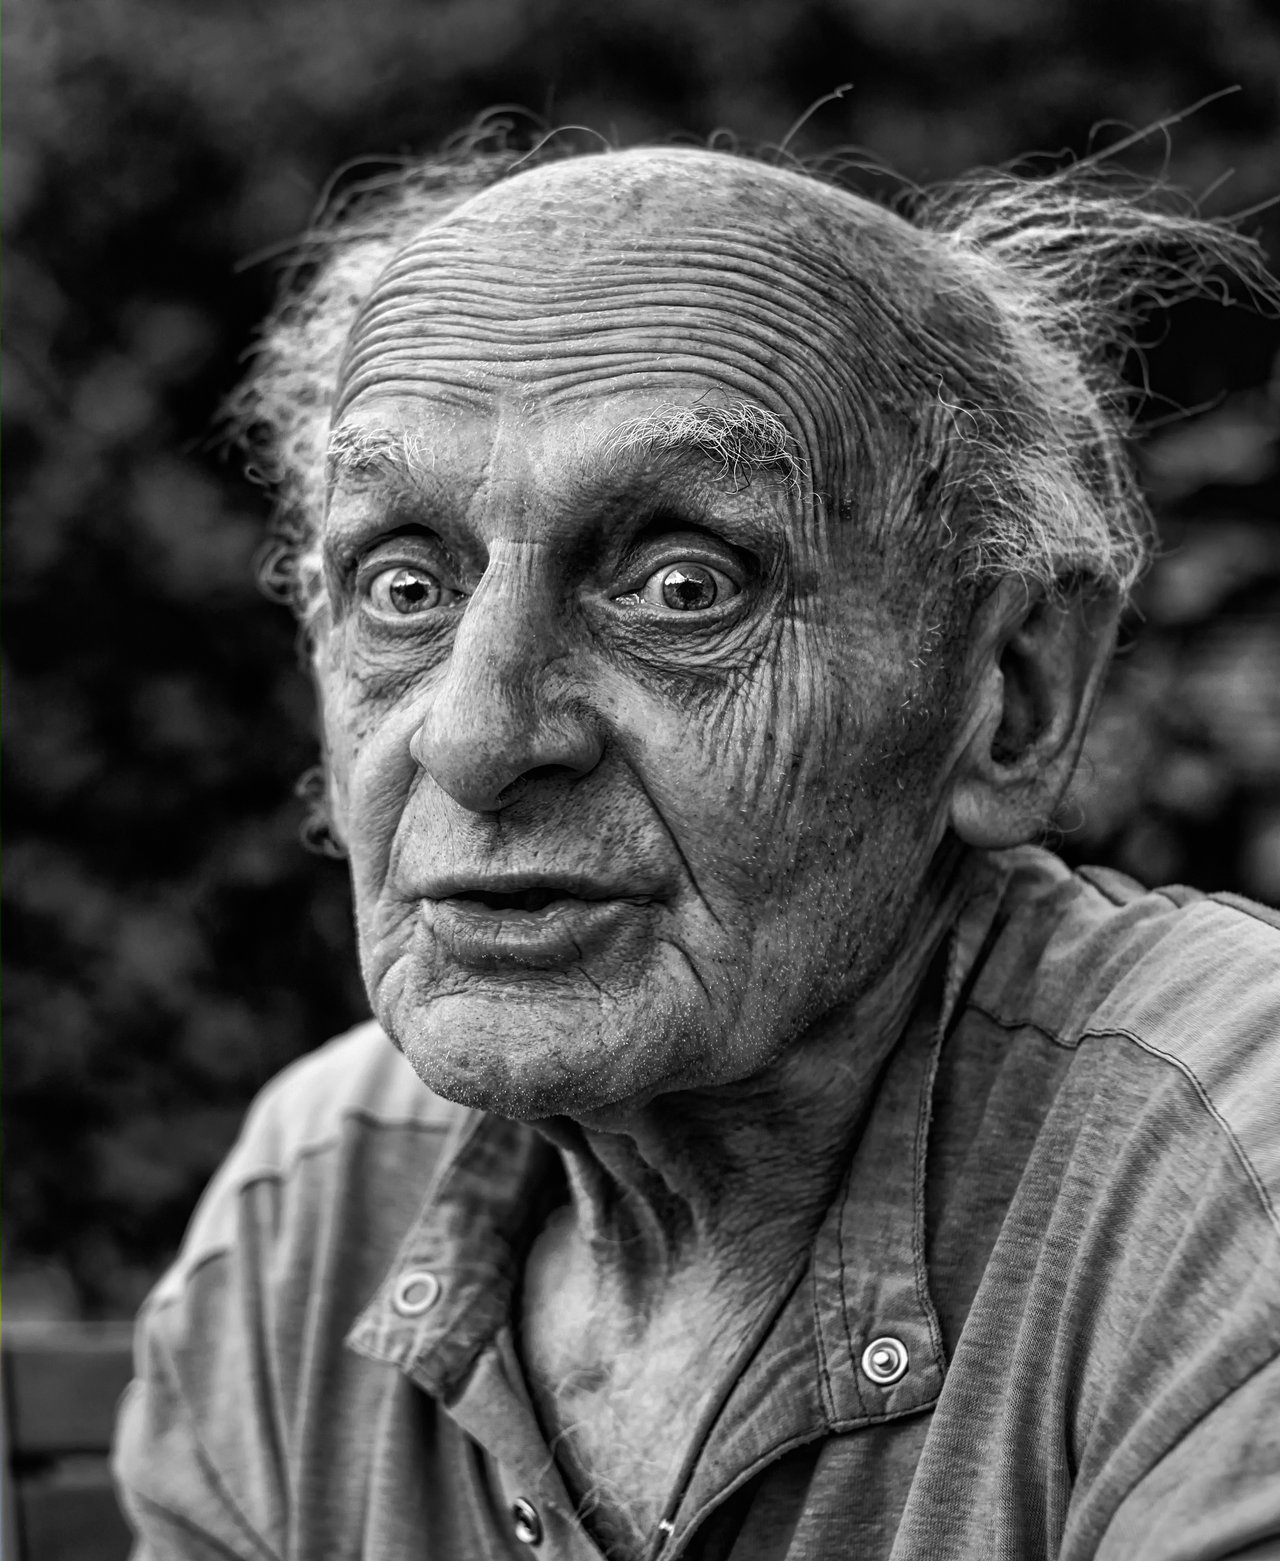 old_man_by_barnulf-d488d6k